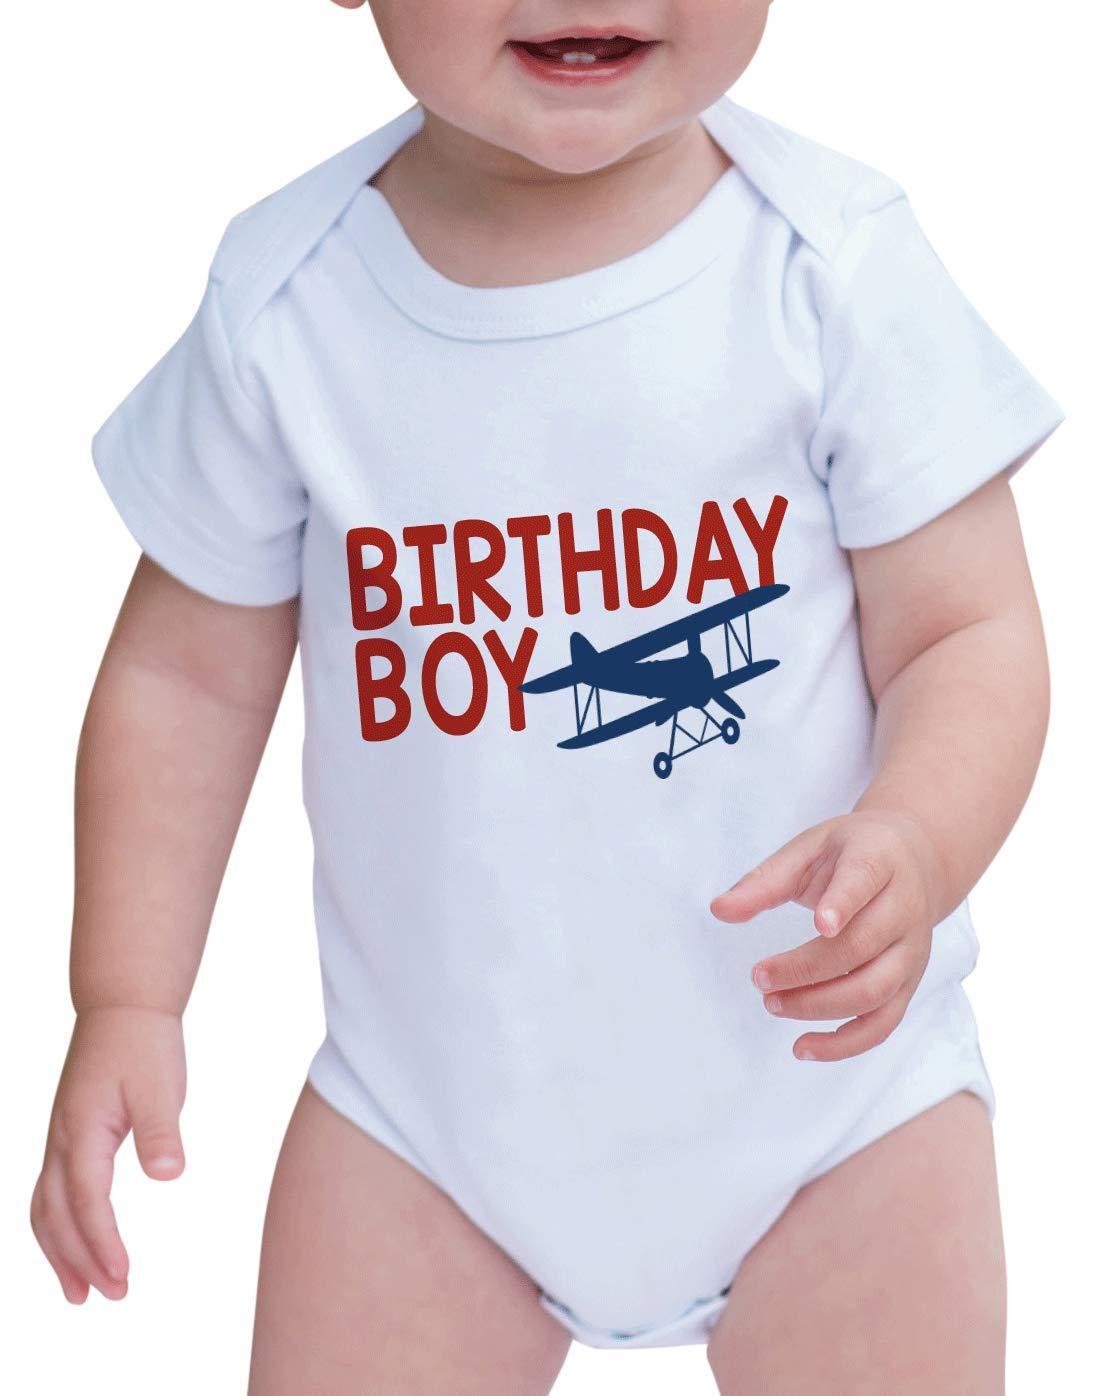 7 ate 9 Apparel Boy's Birthday Boy Biplane Airplane Onepiece